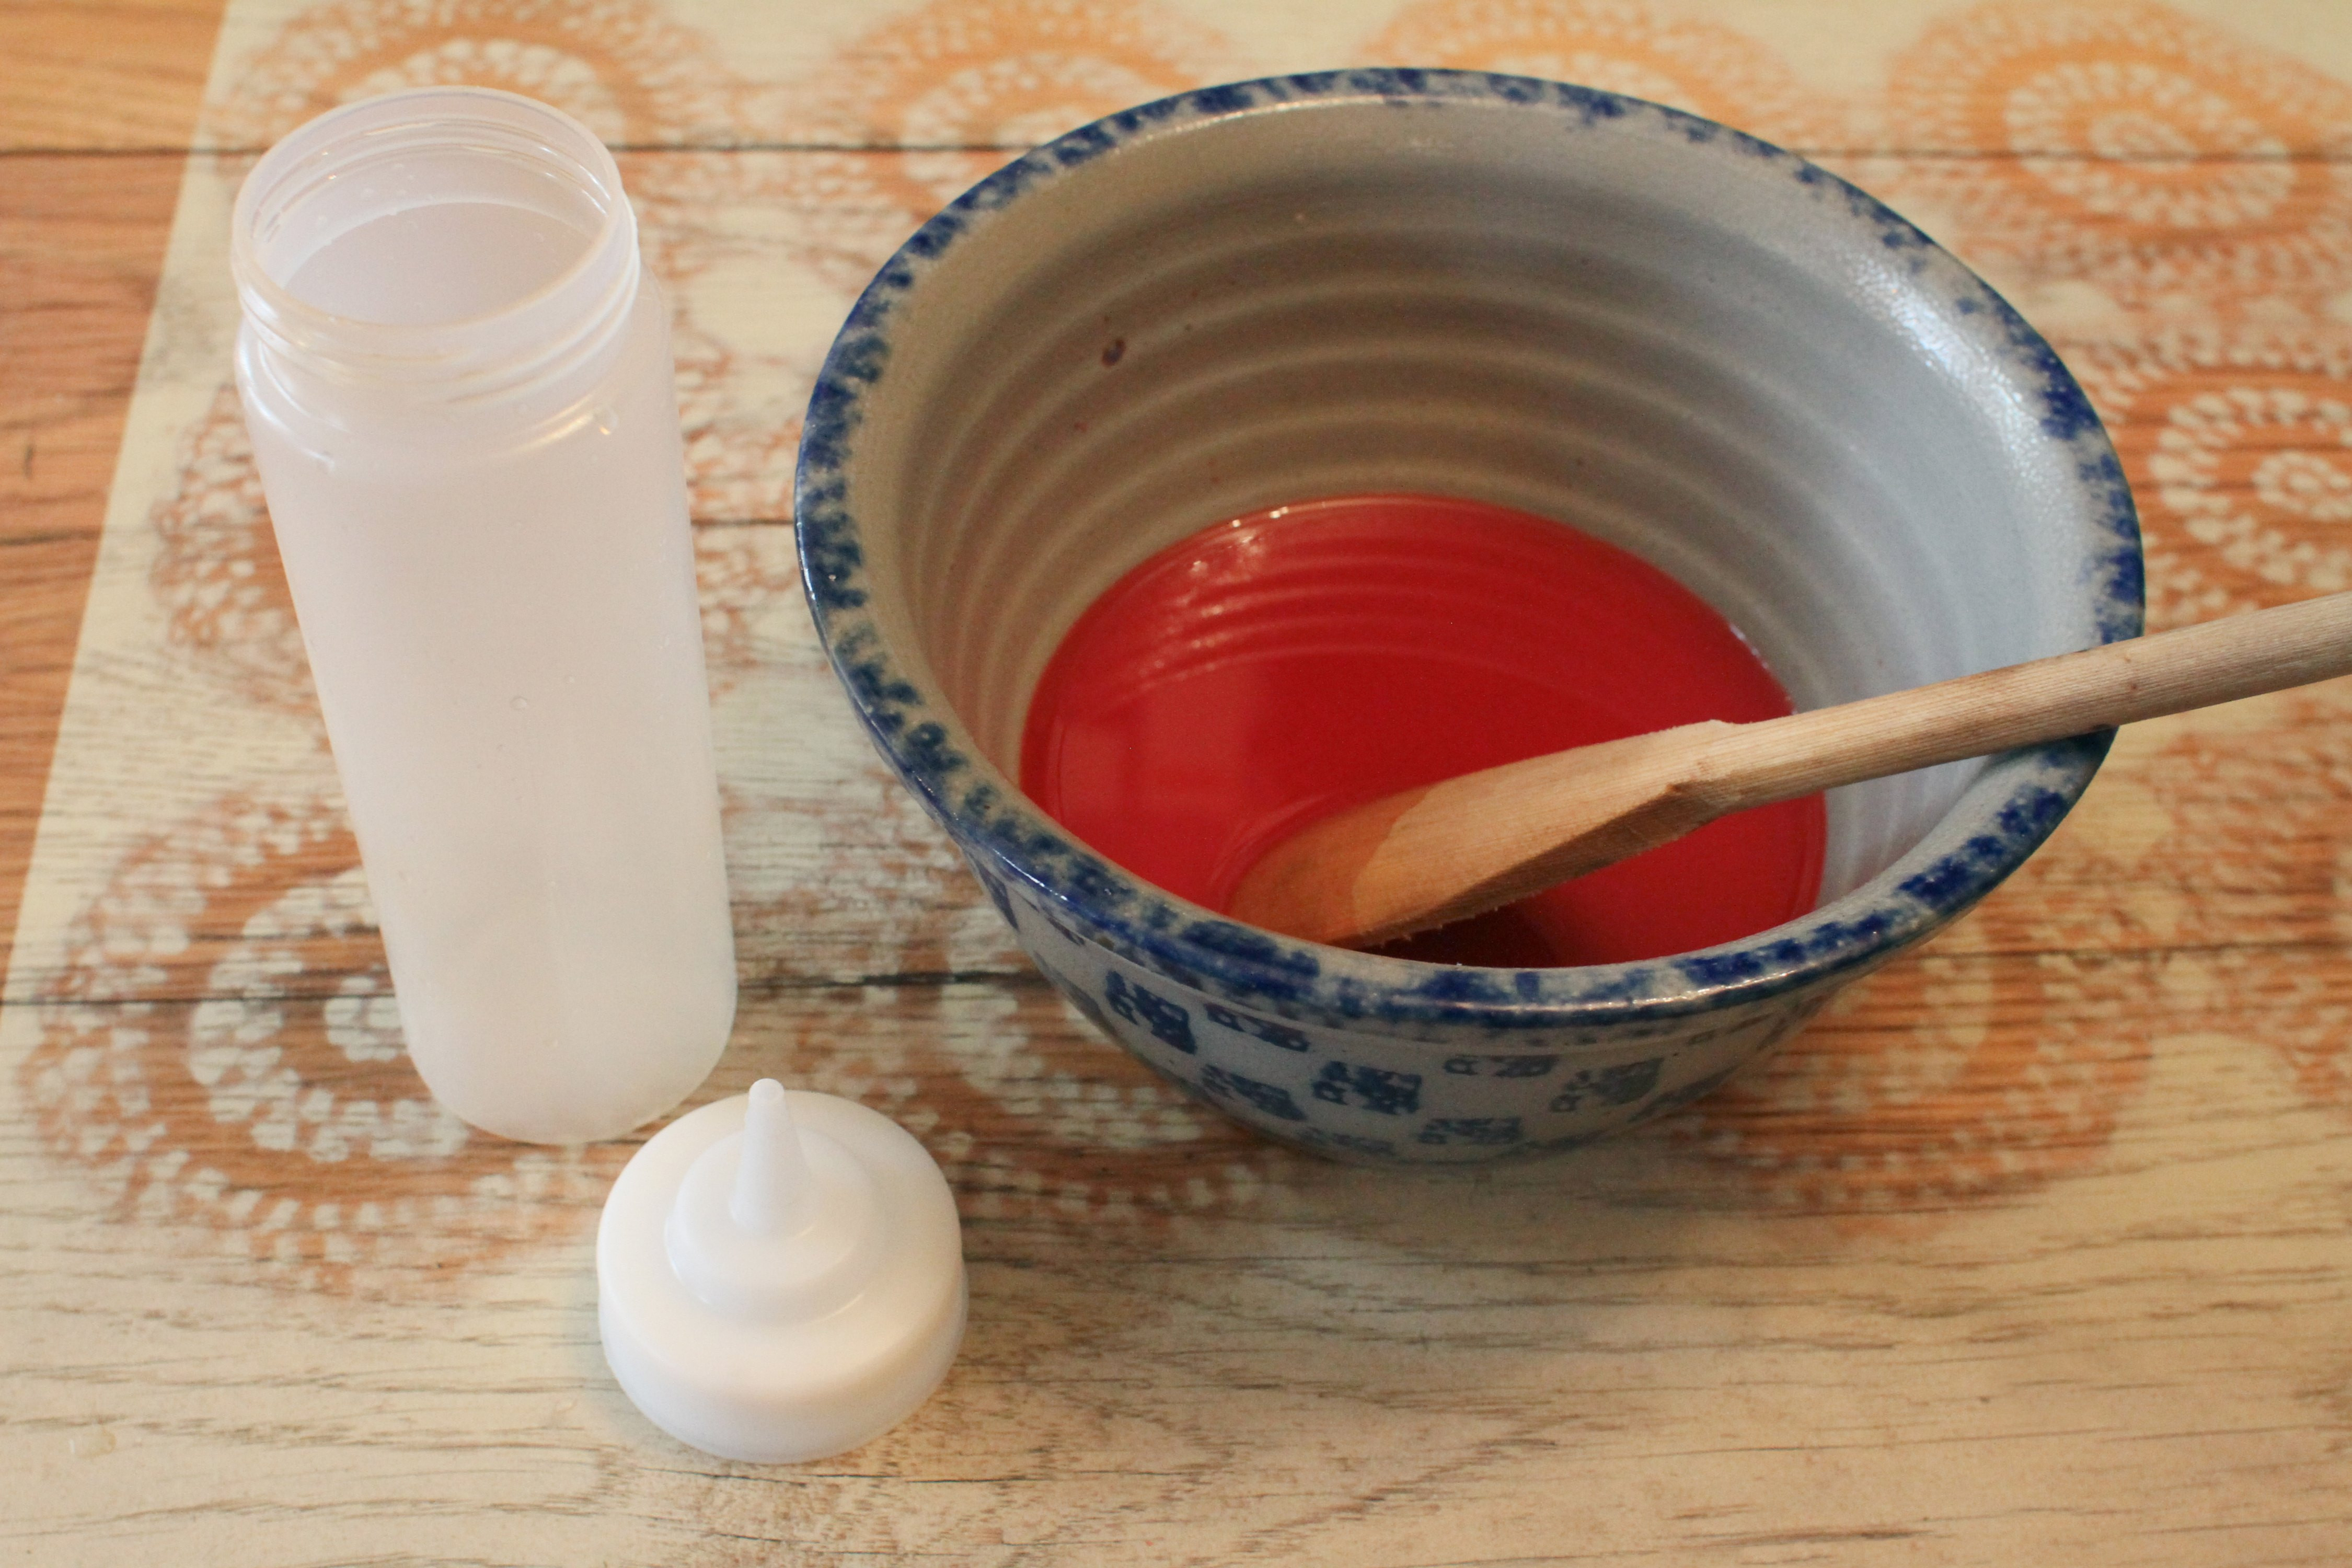 DIY Black Hair Dye  How to Make Homemade Red Hair Dye